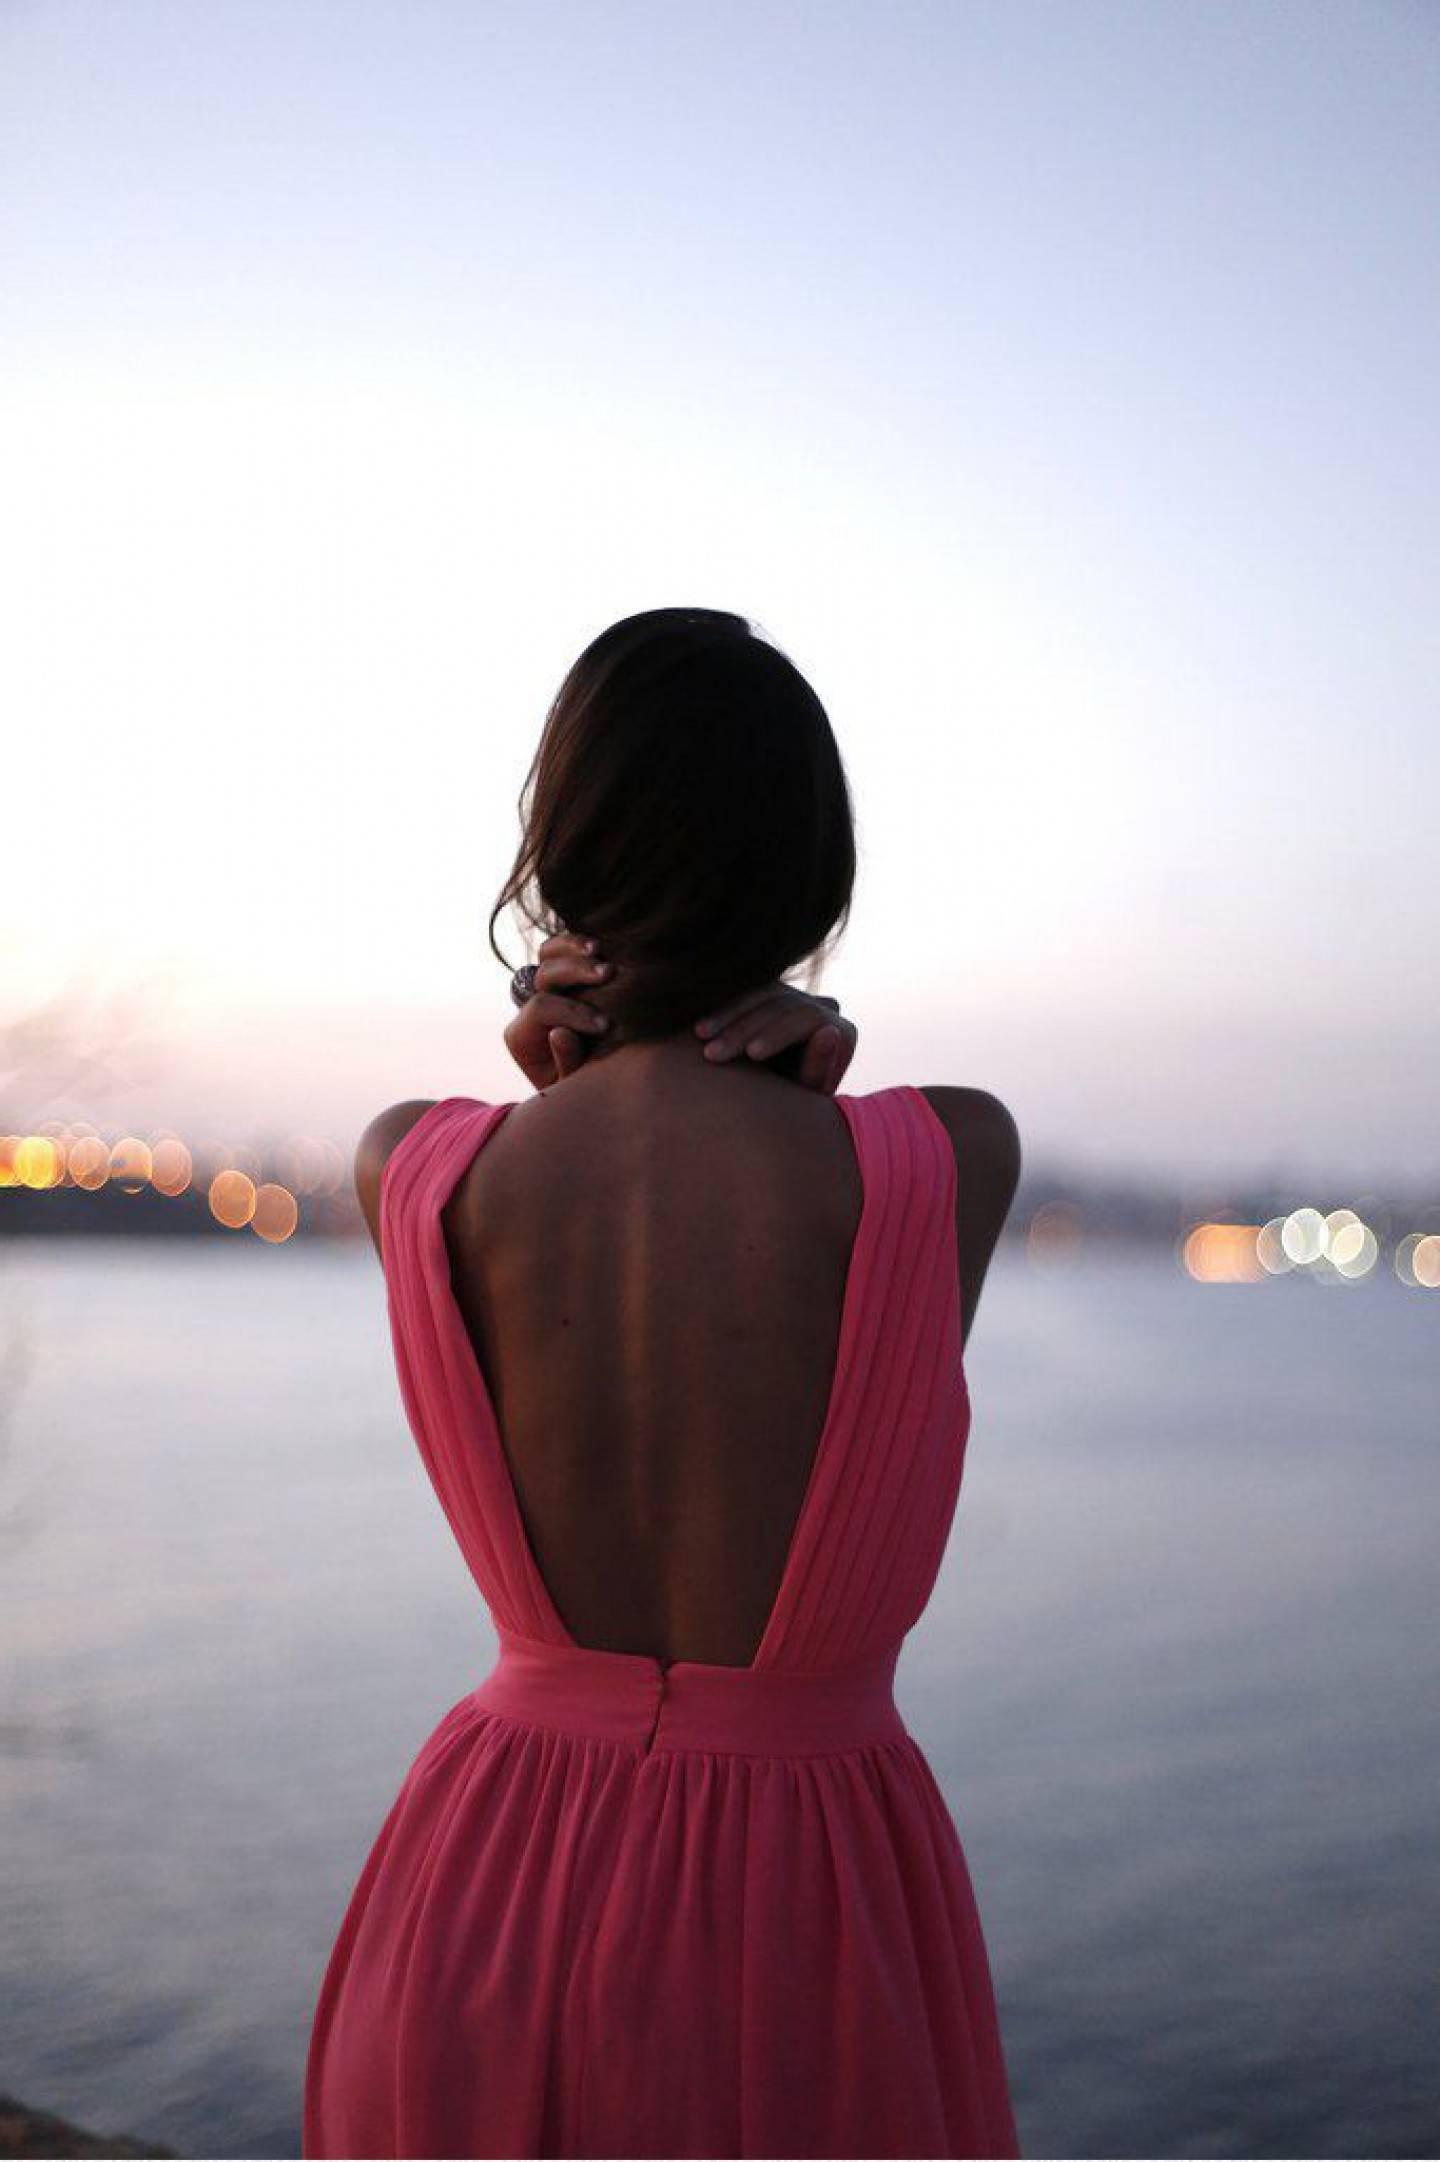 Фото брюнетки со спины Брюнетка на аву спиной. (10 фото)